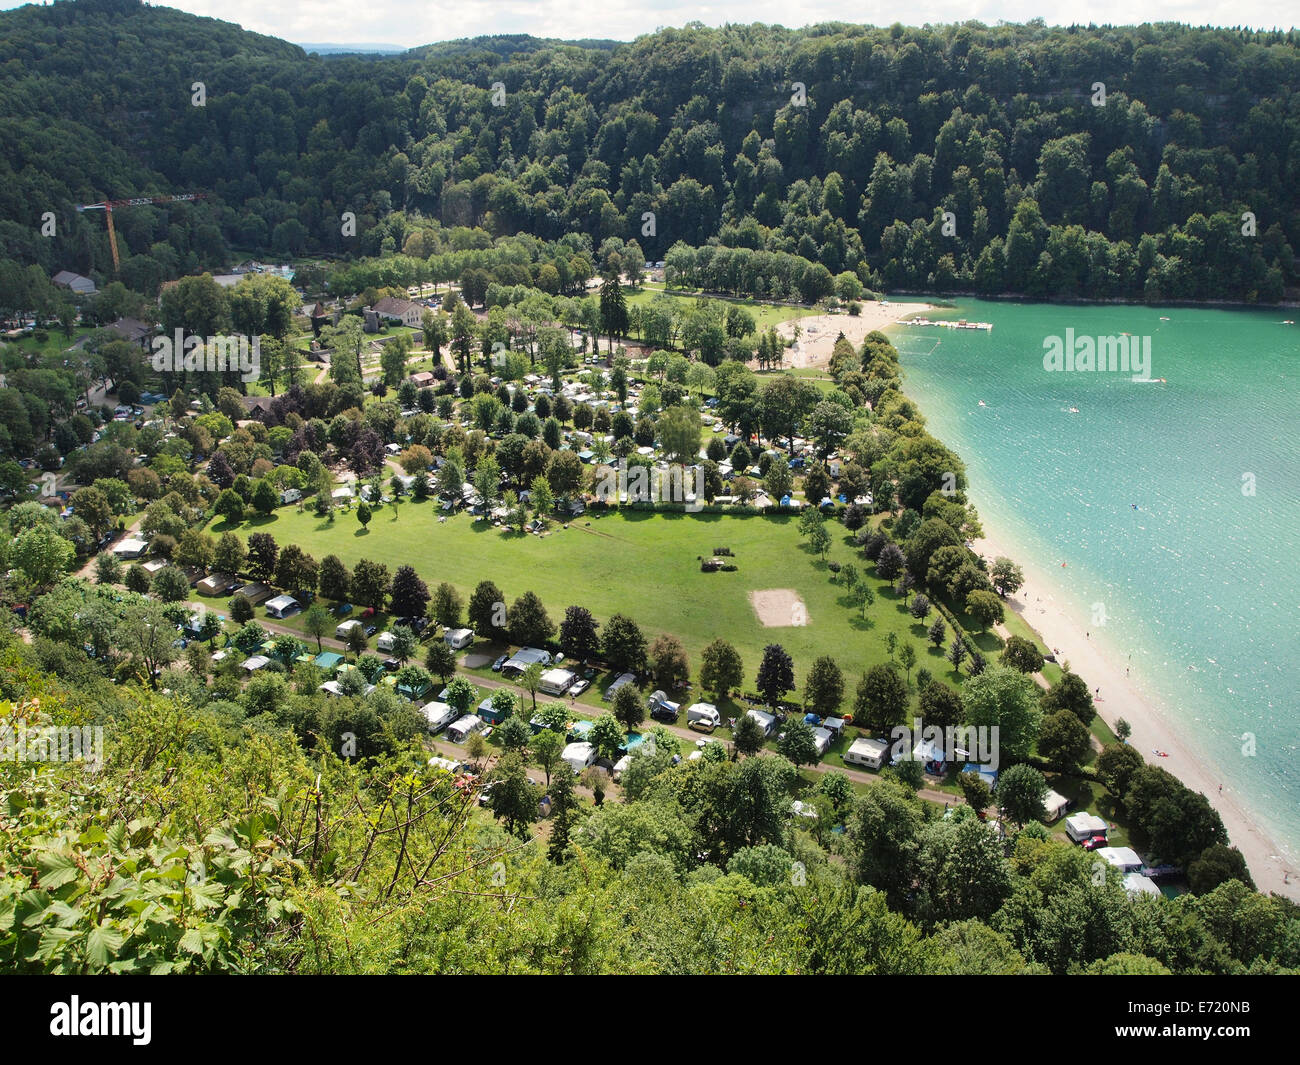 camping in jura france